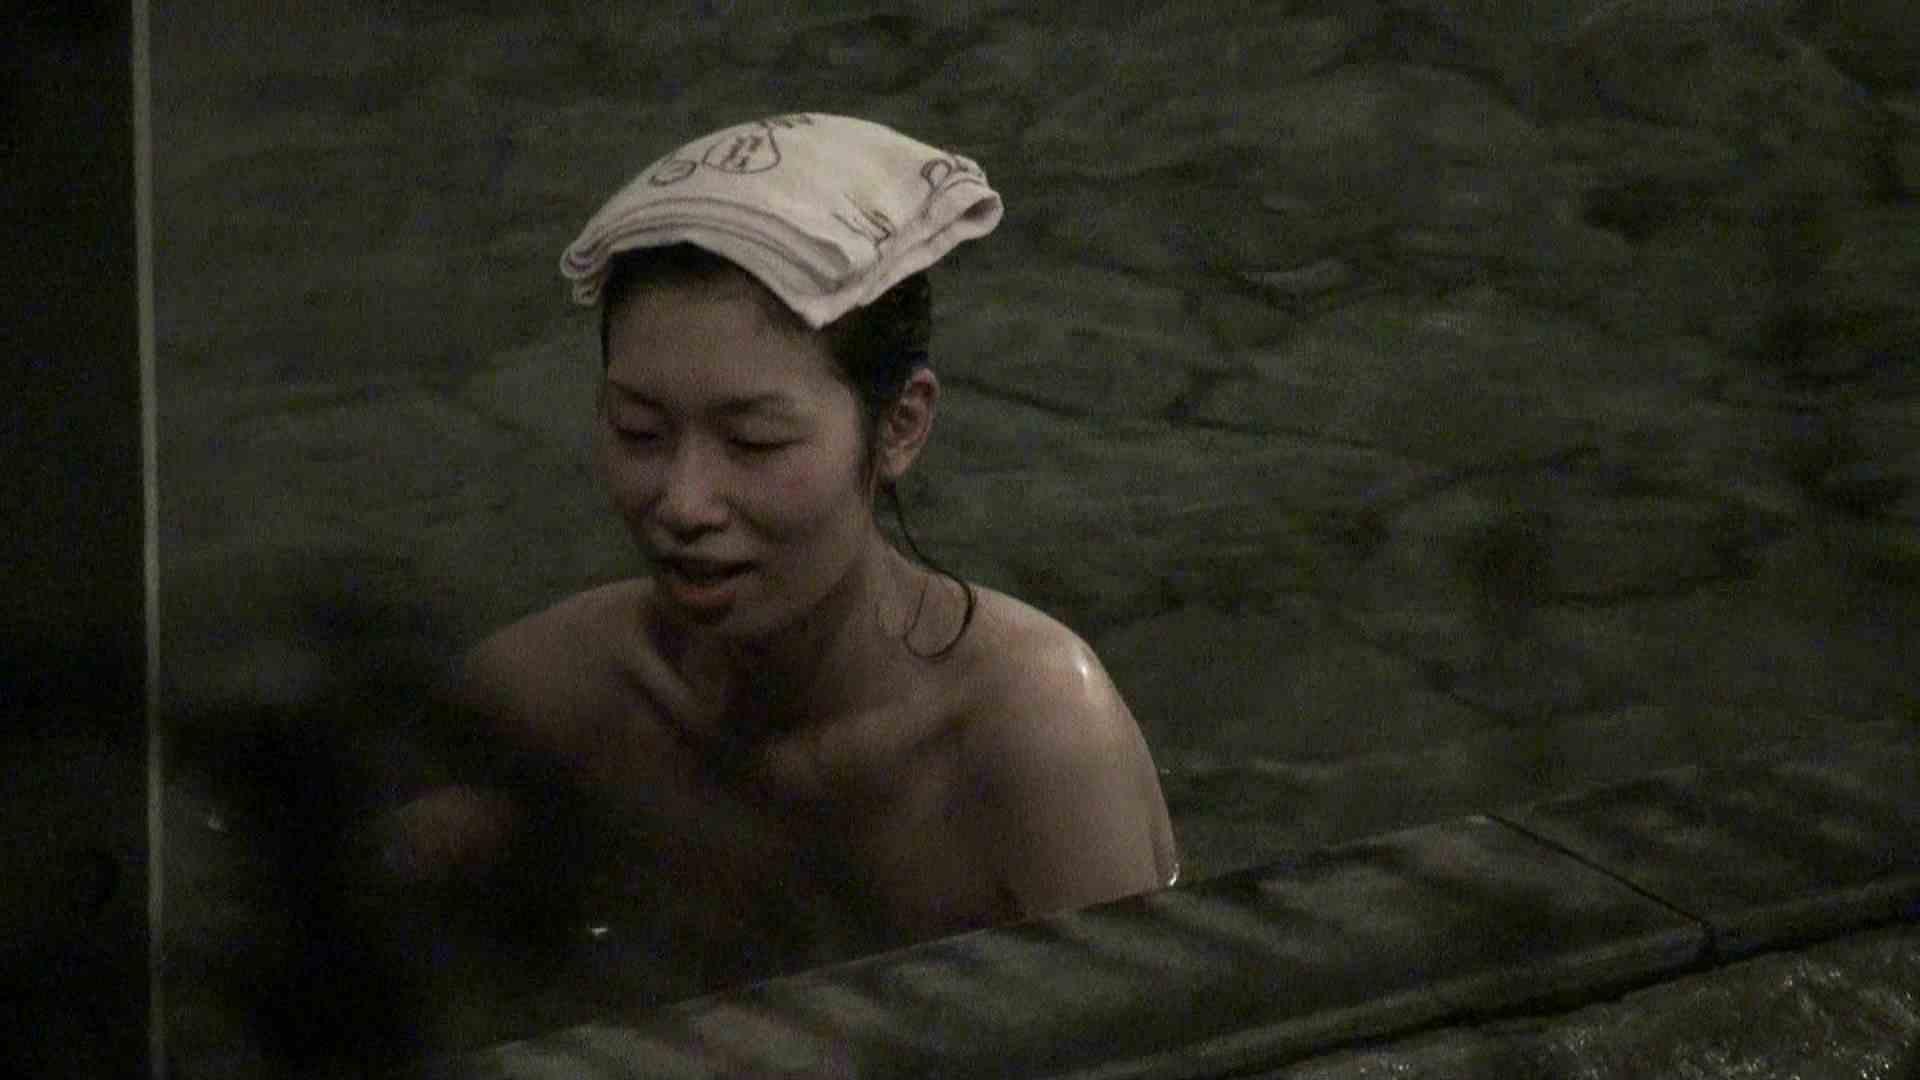 Aquaな露天風呂Vol.399 盗撮 | OLセックス  67画像 67